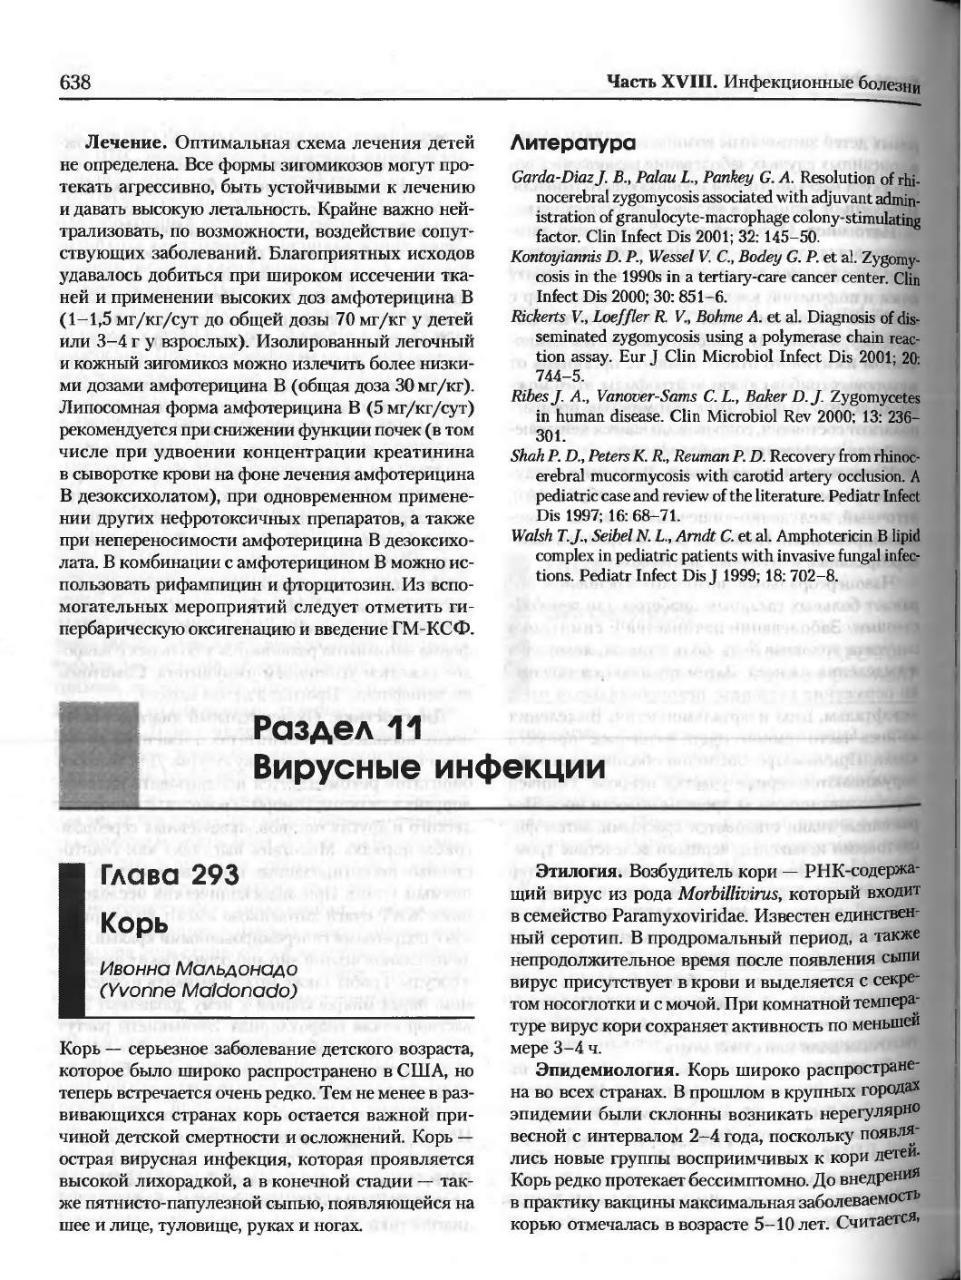 Nelson Textbook Of Pediatrics Rus Pdf Archive